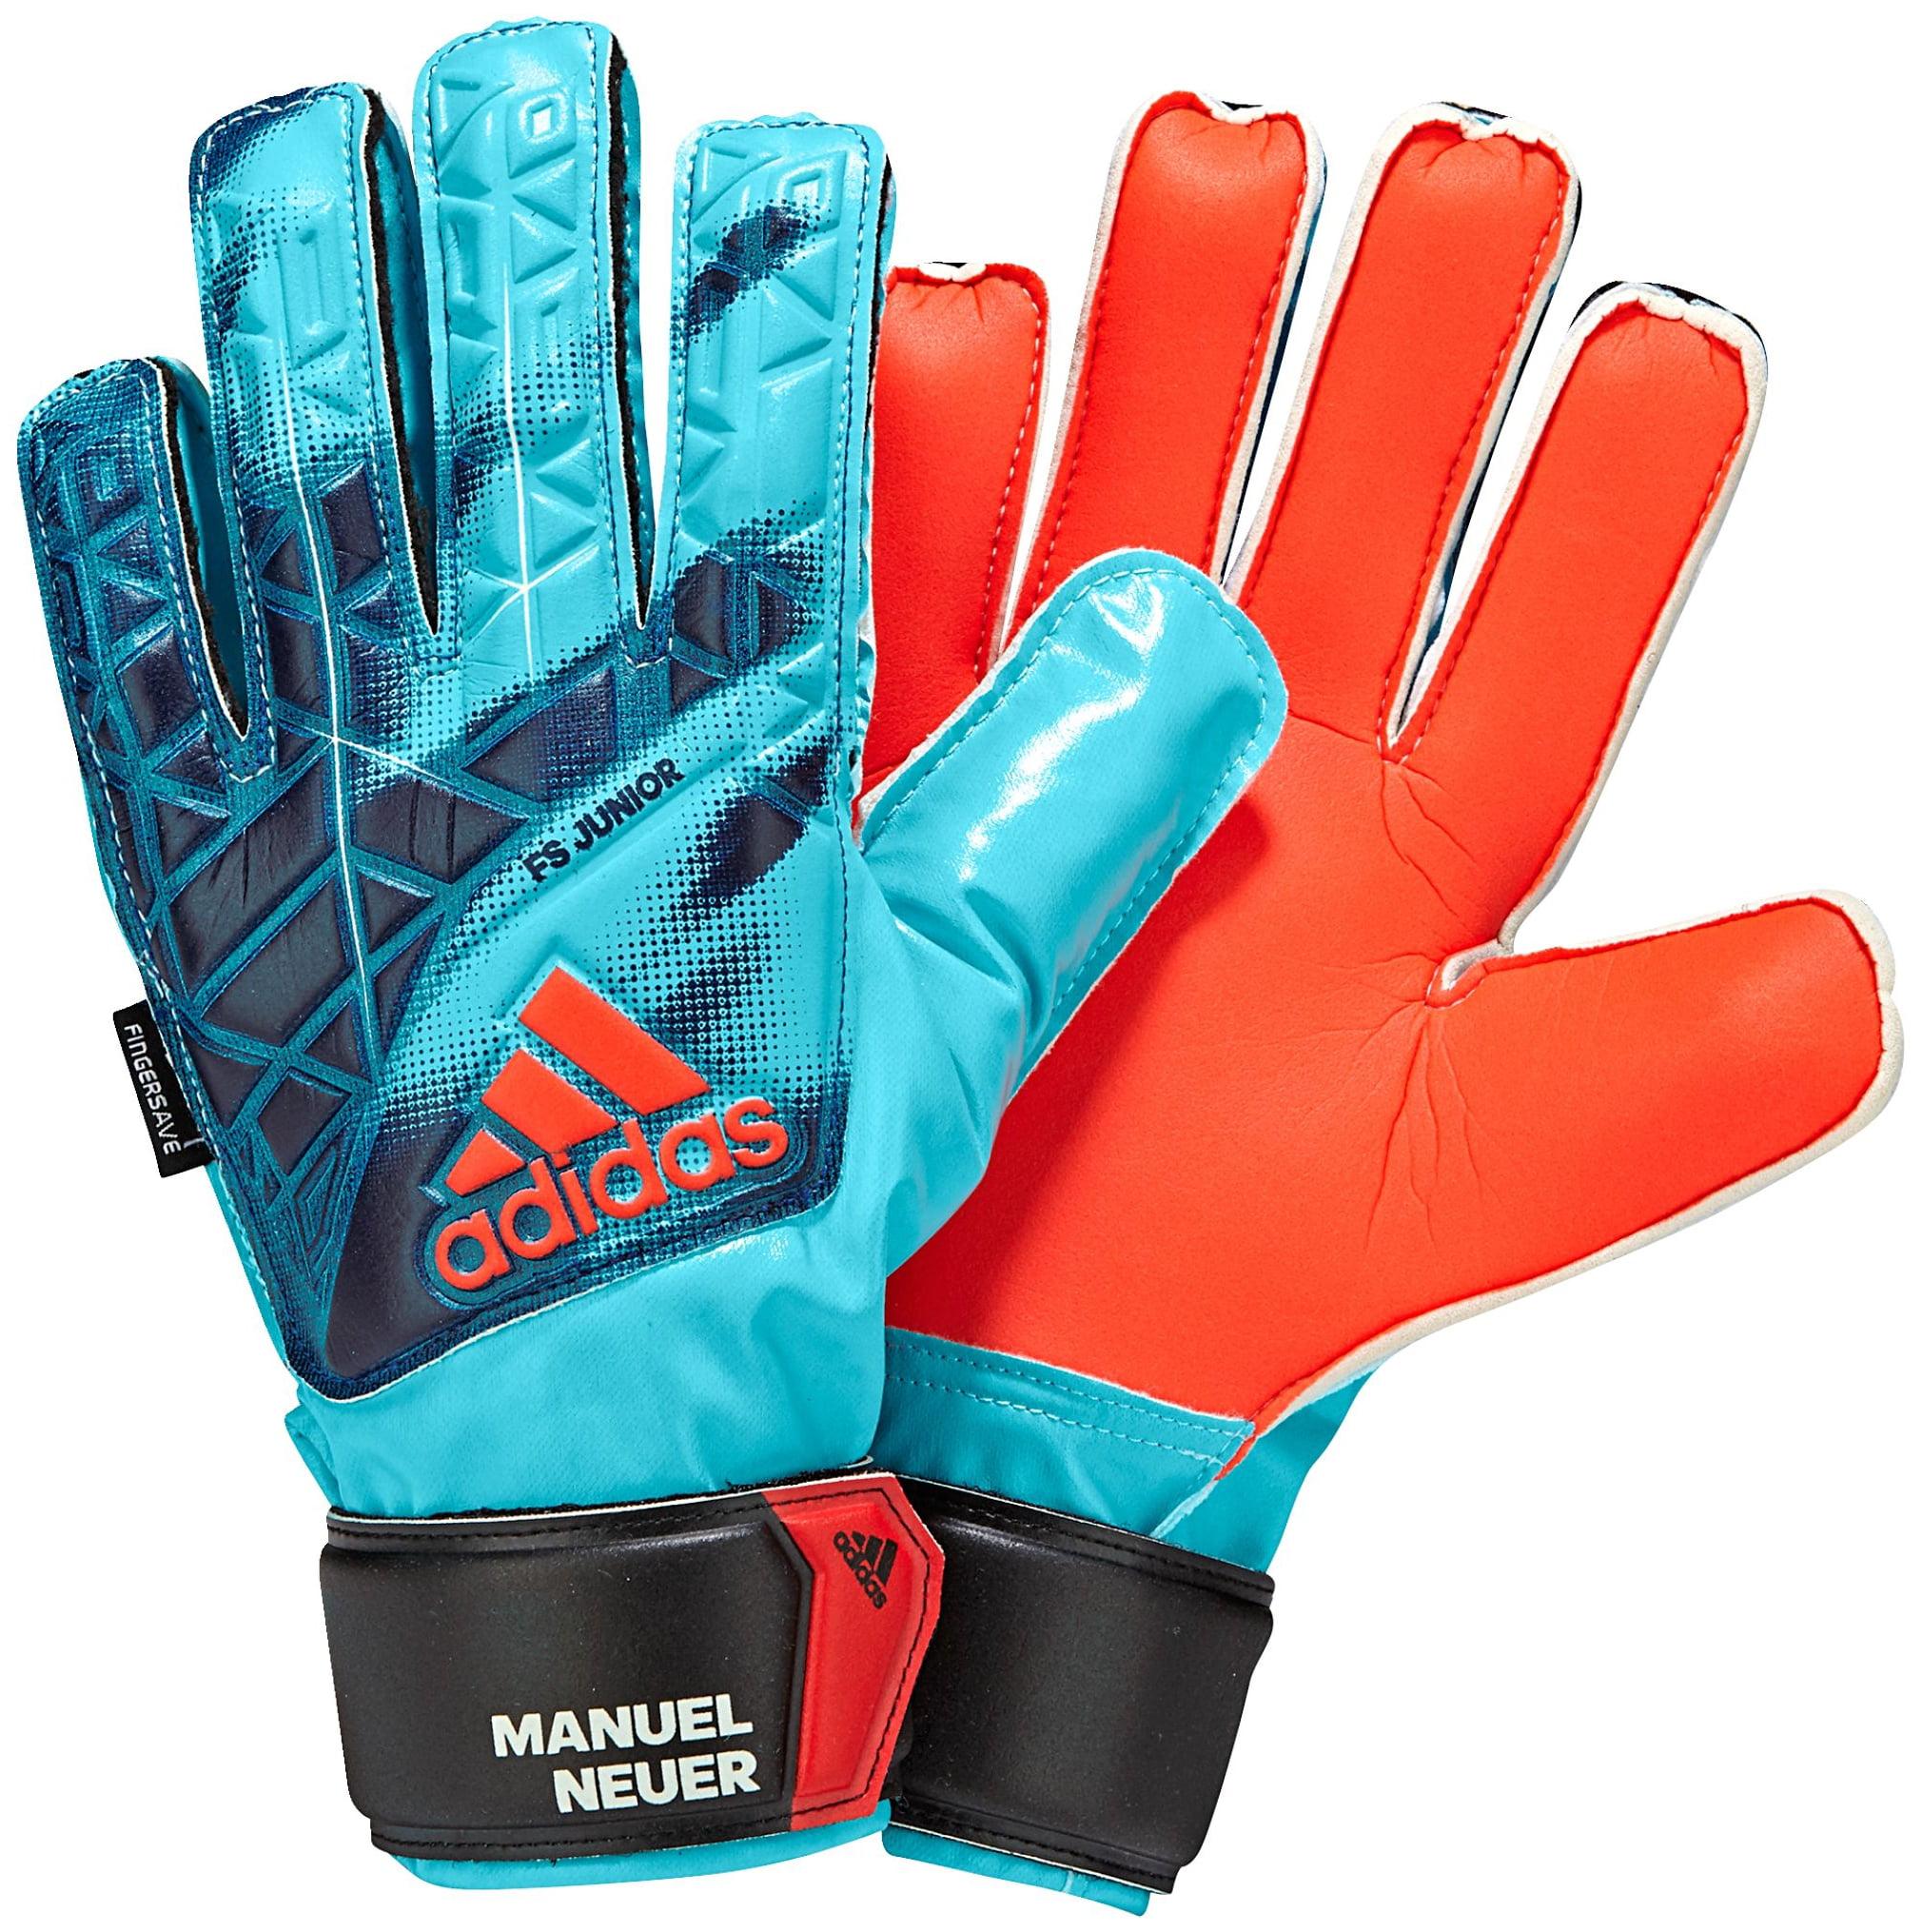 Adidas Youth Ace Fingersave Junior Manuel Neuer Soccer Go...